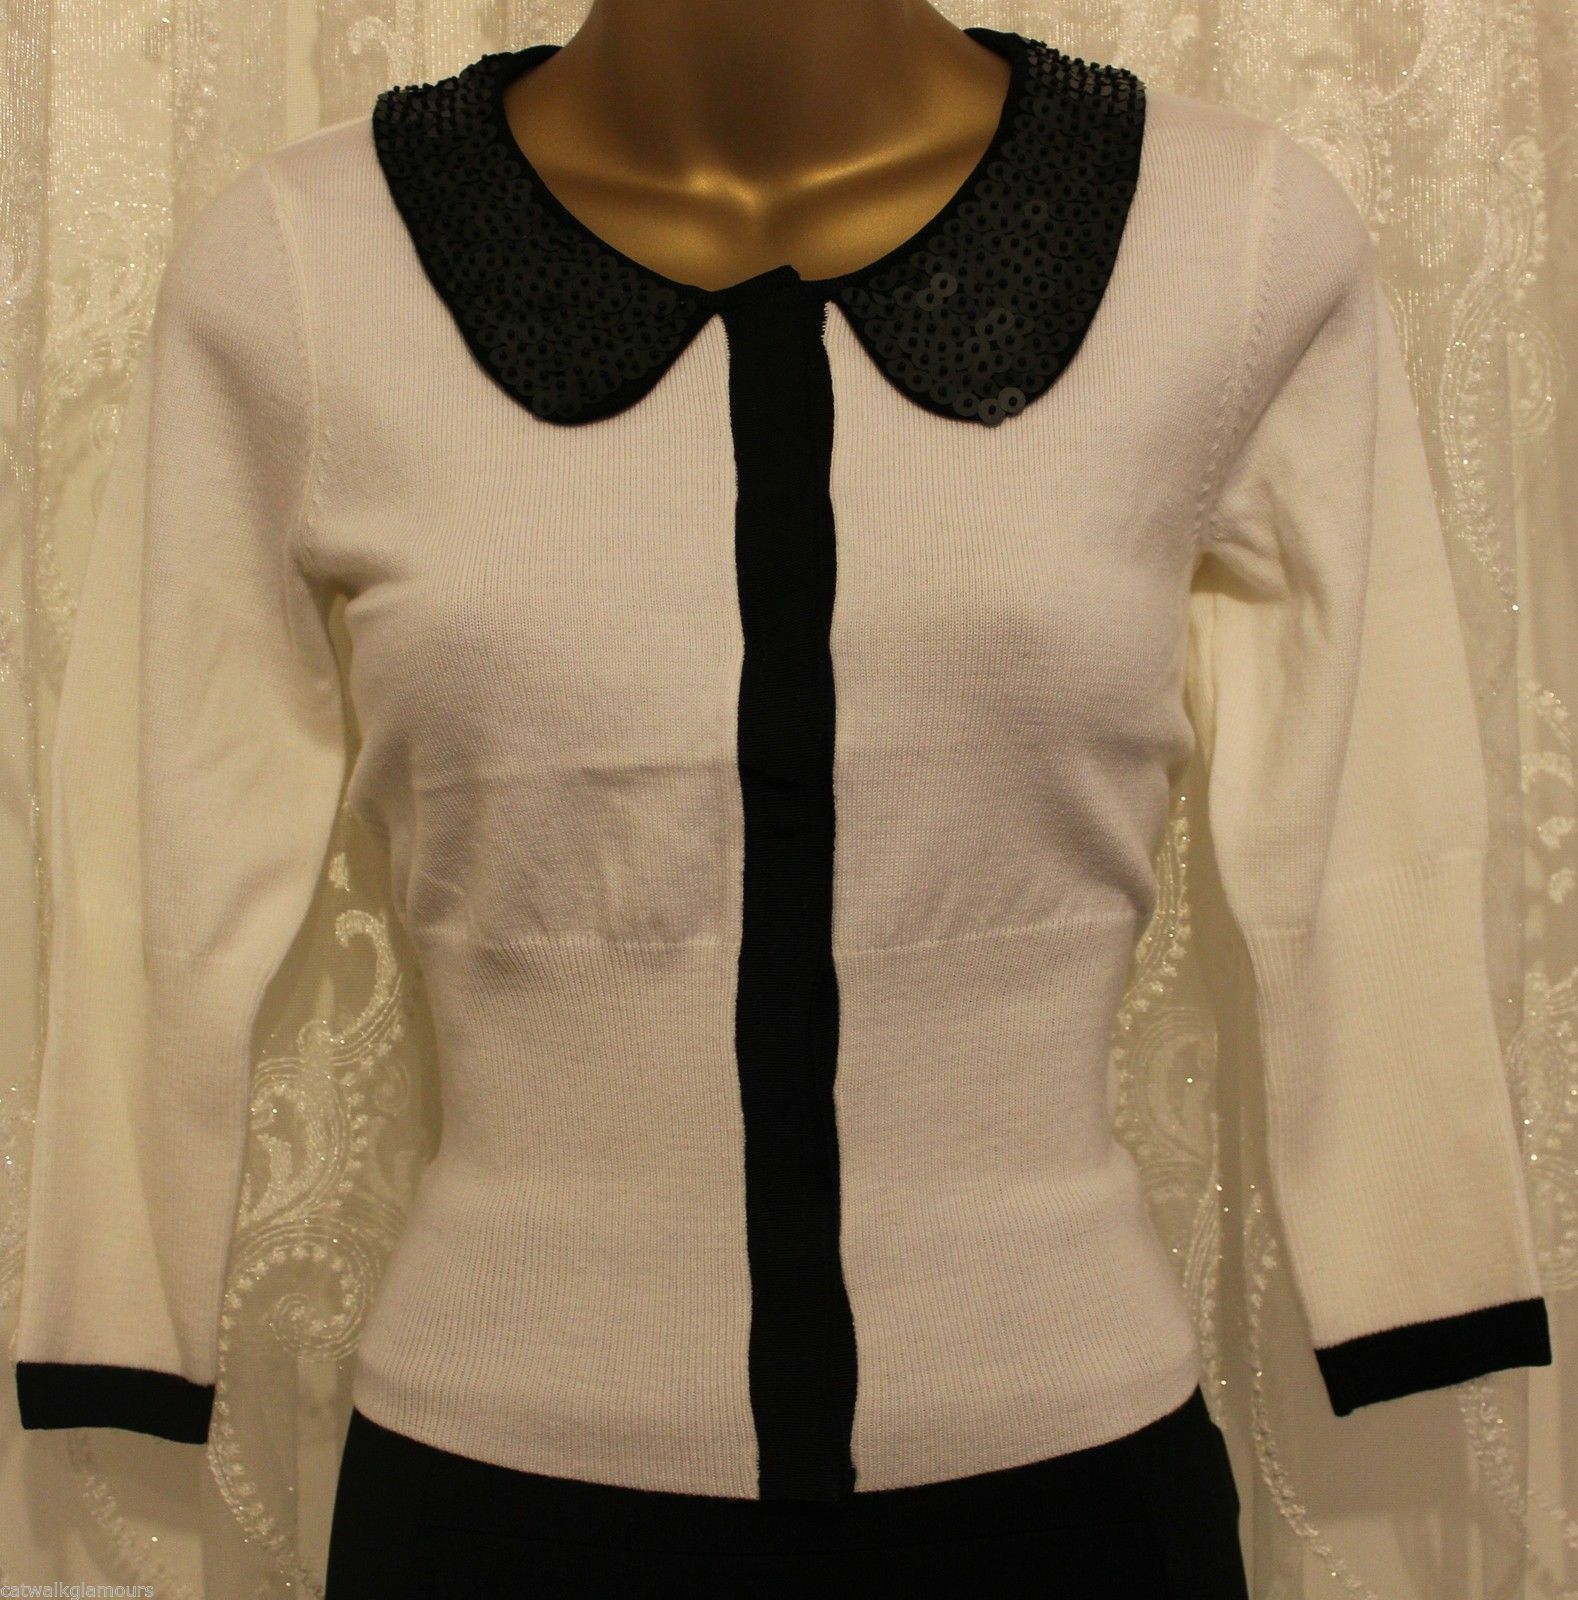 Karen Millen Contrast Embellished Collar Knit Cardigan Wool Jumper Top